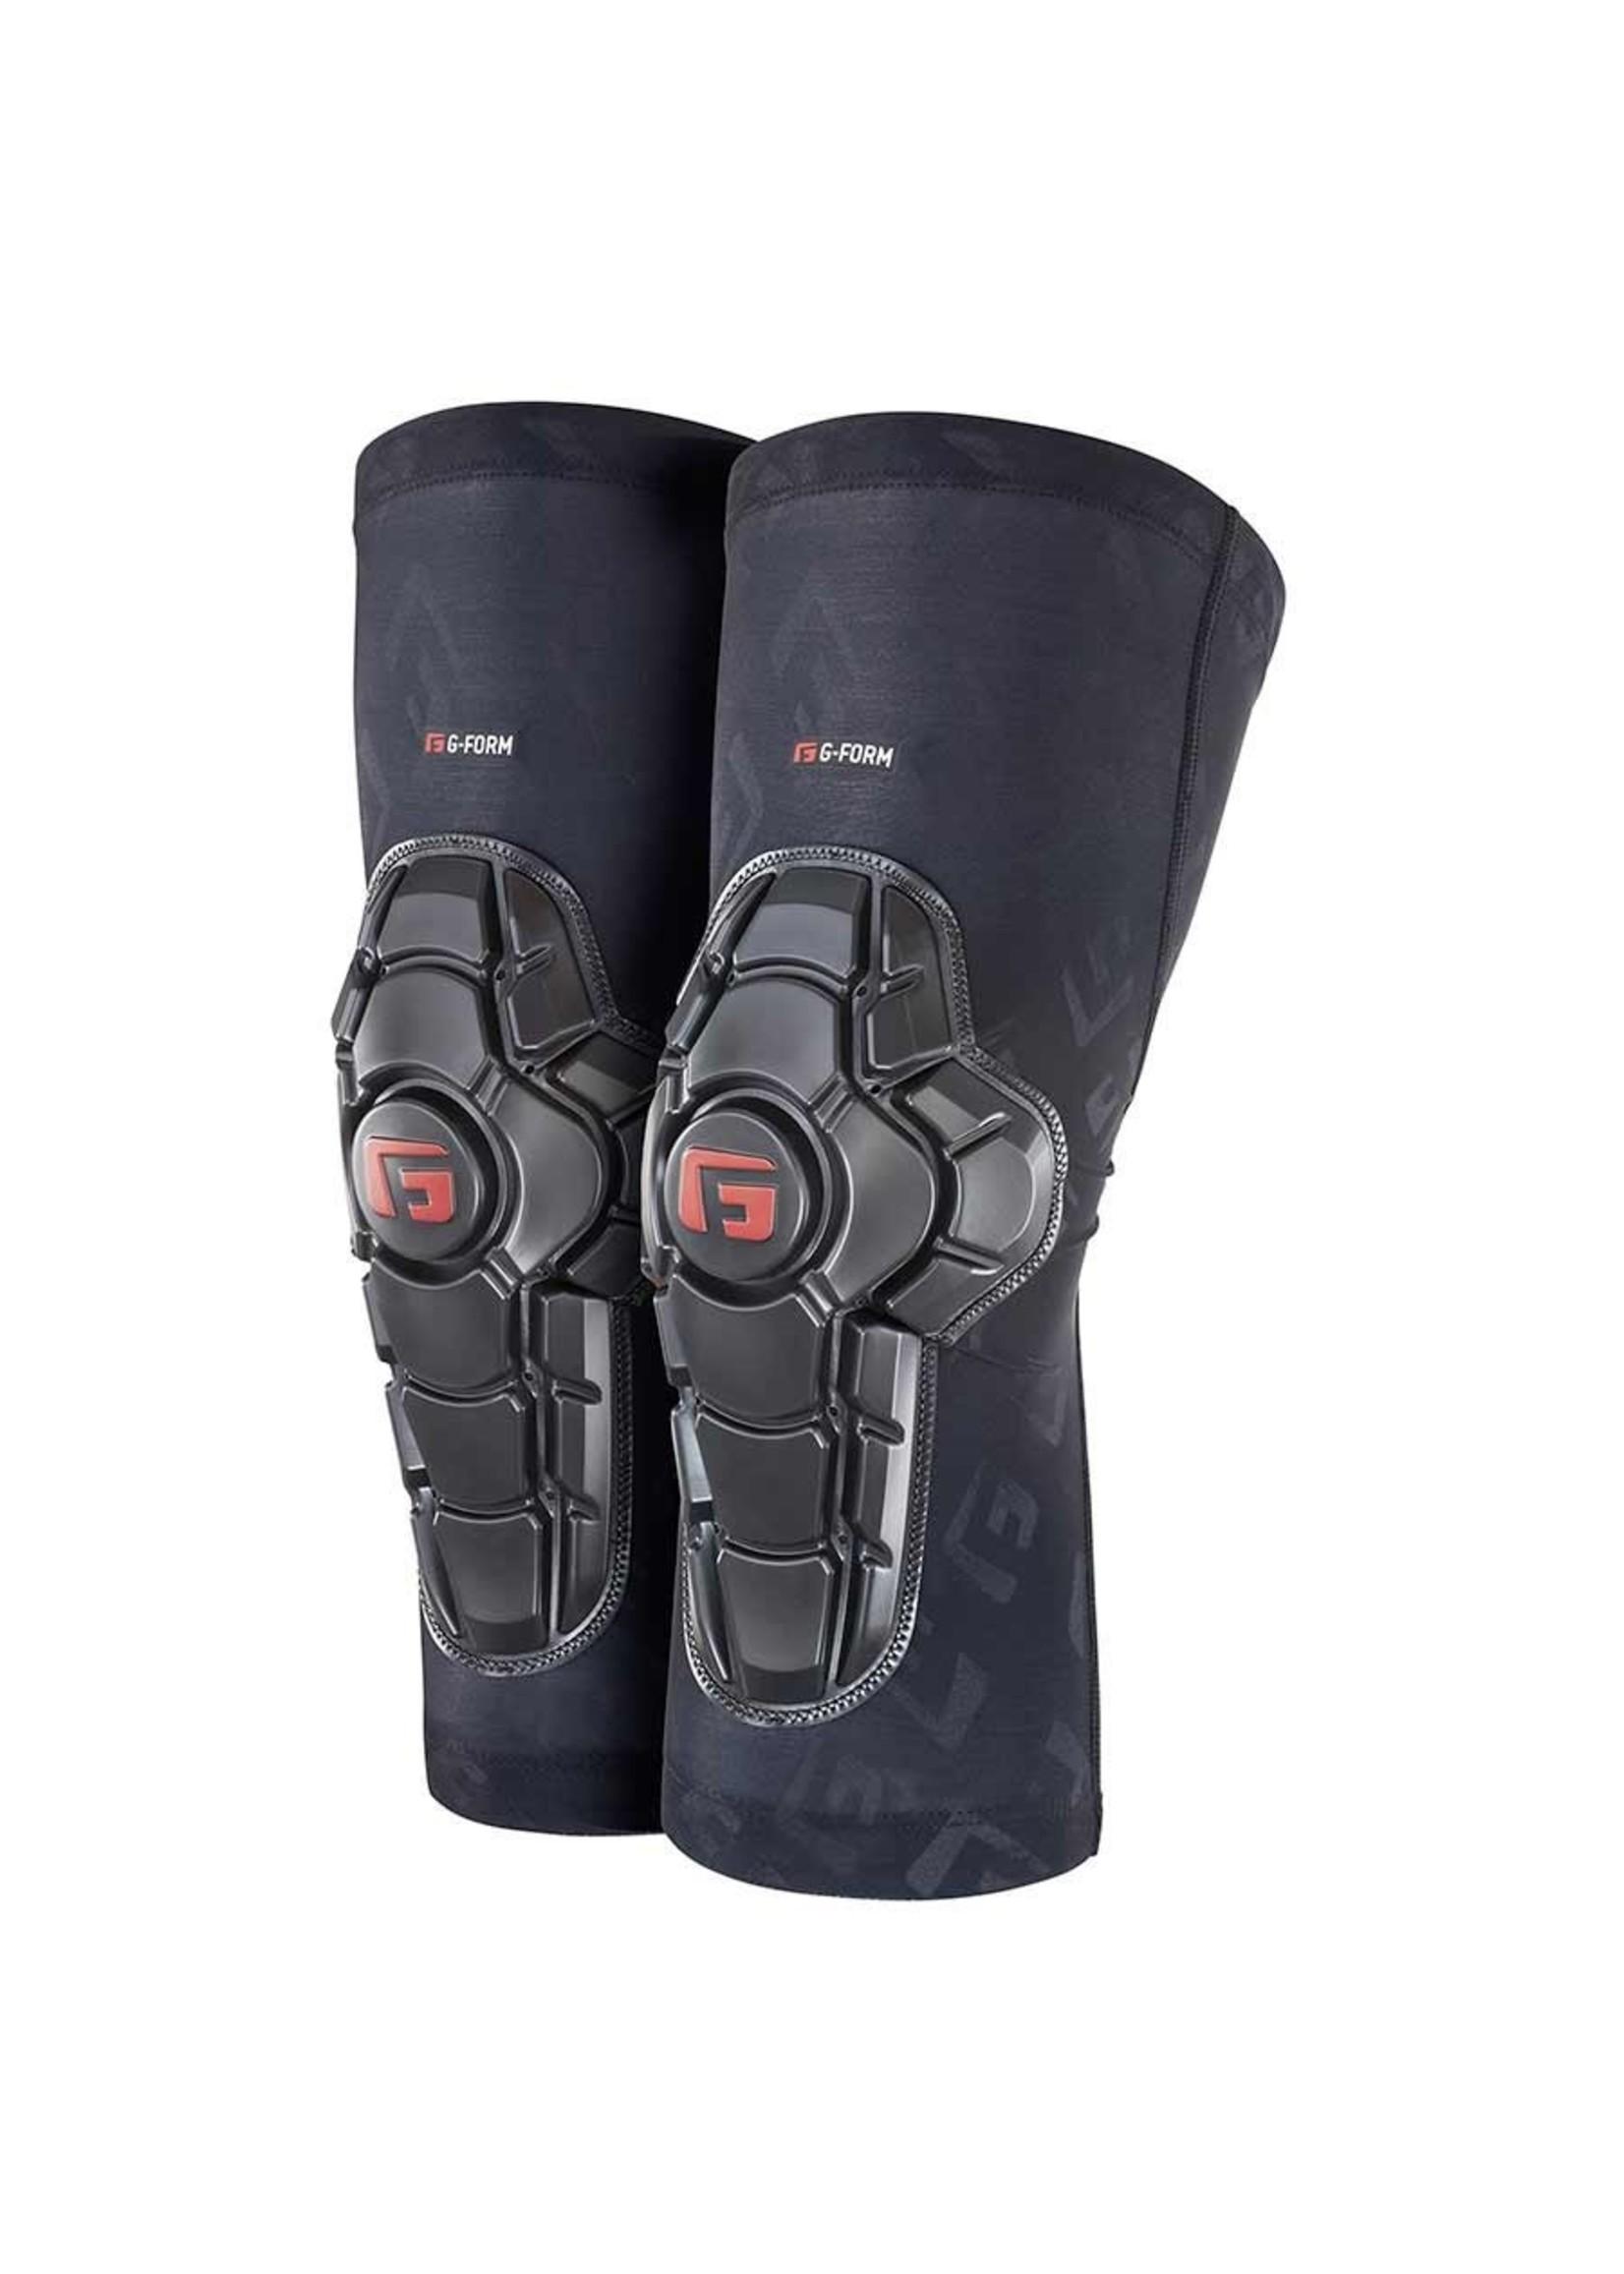 G-Form Pro X2 Knee pads, protège genous